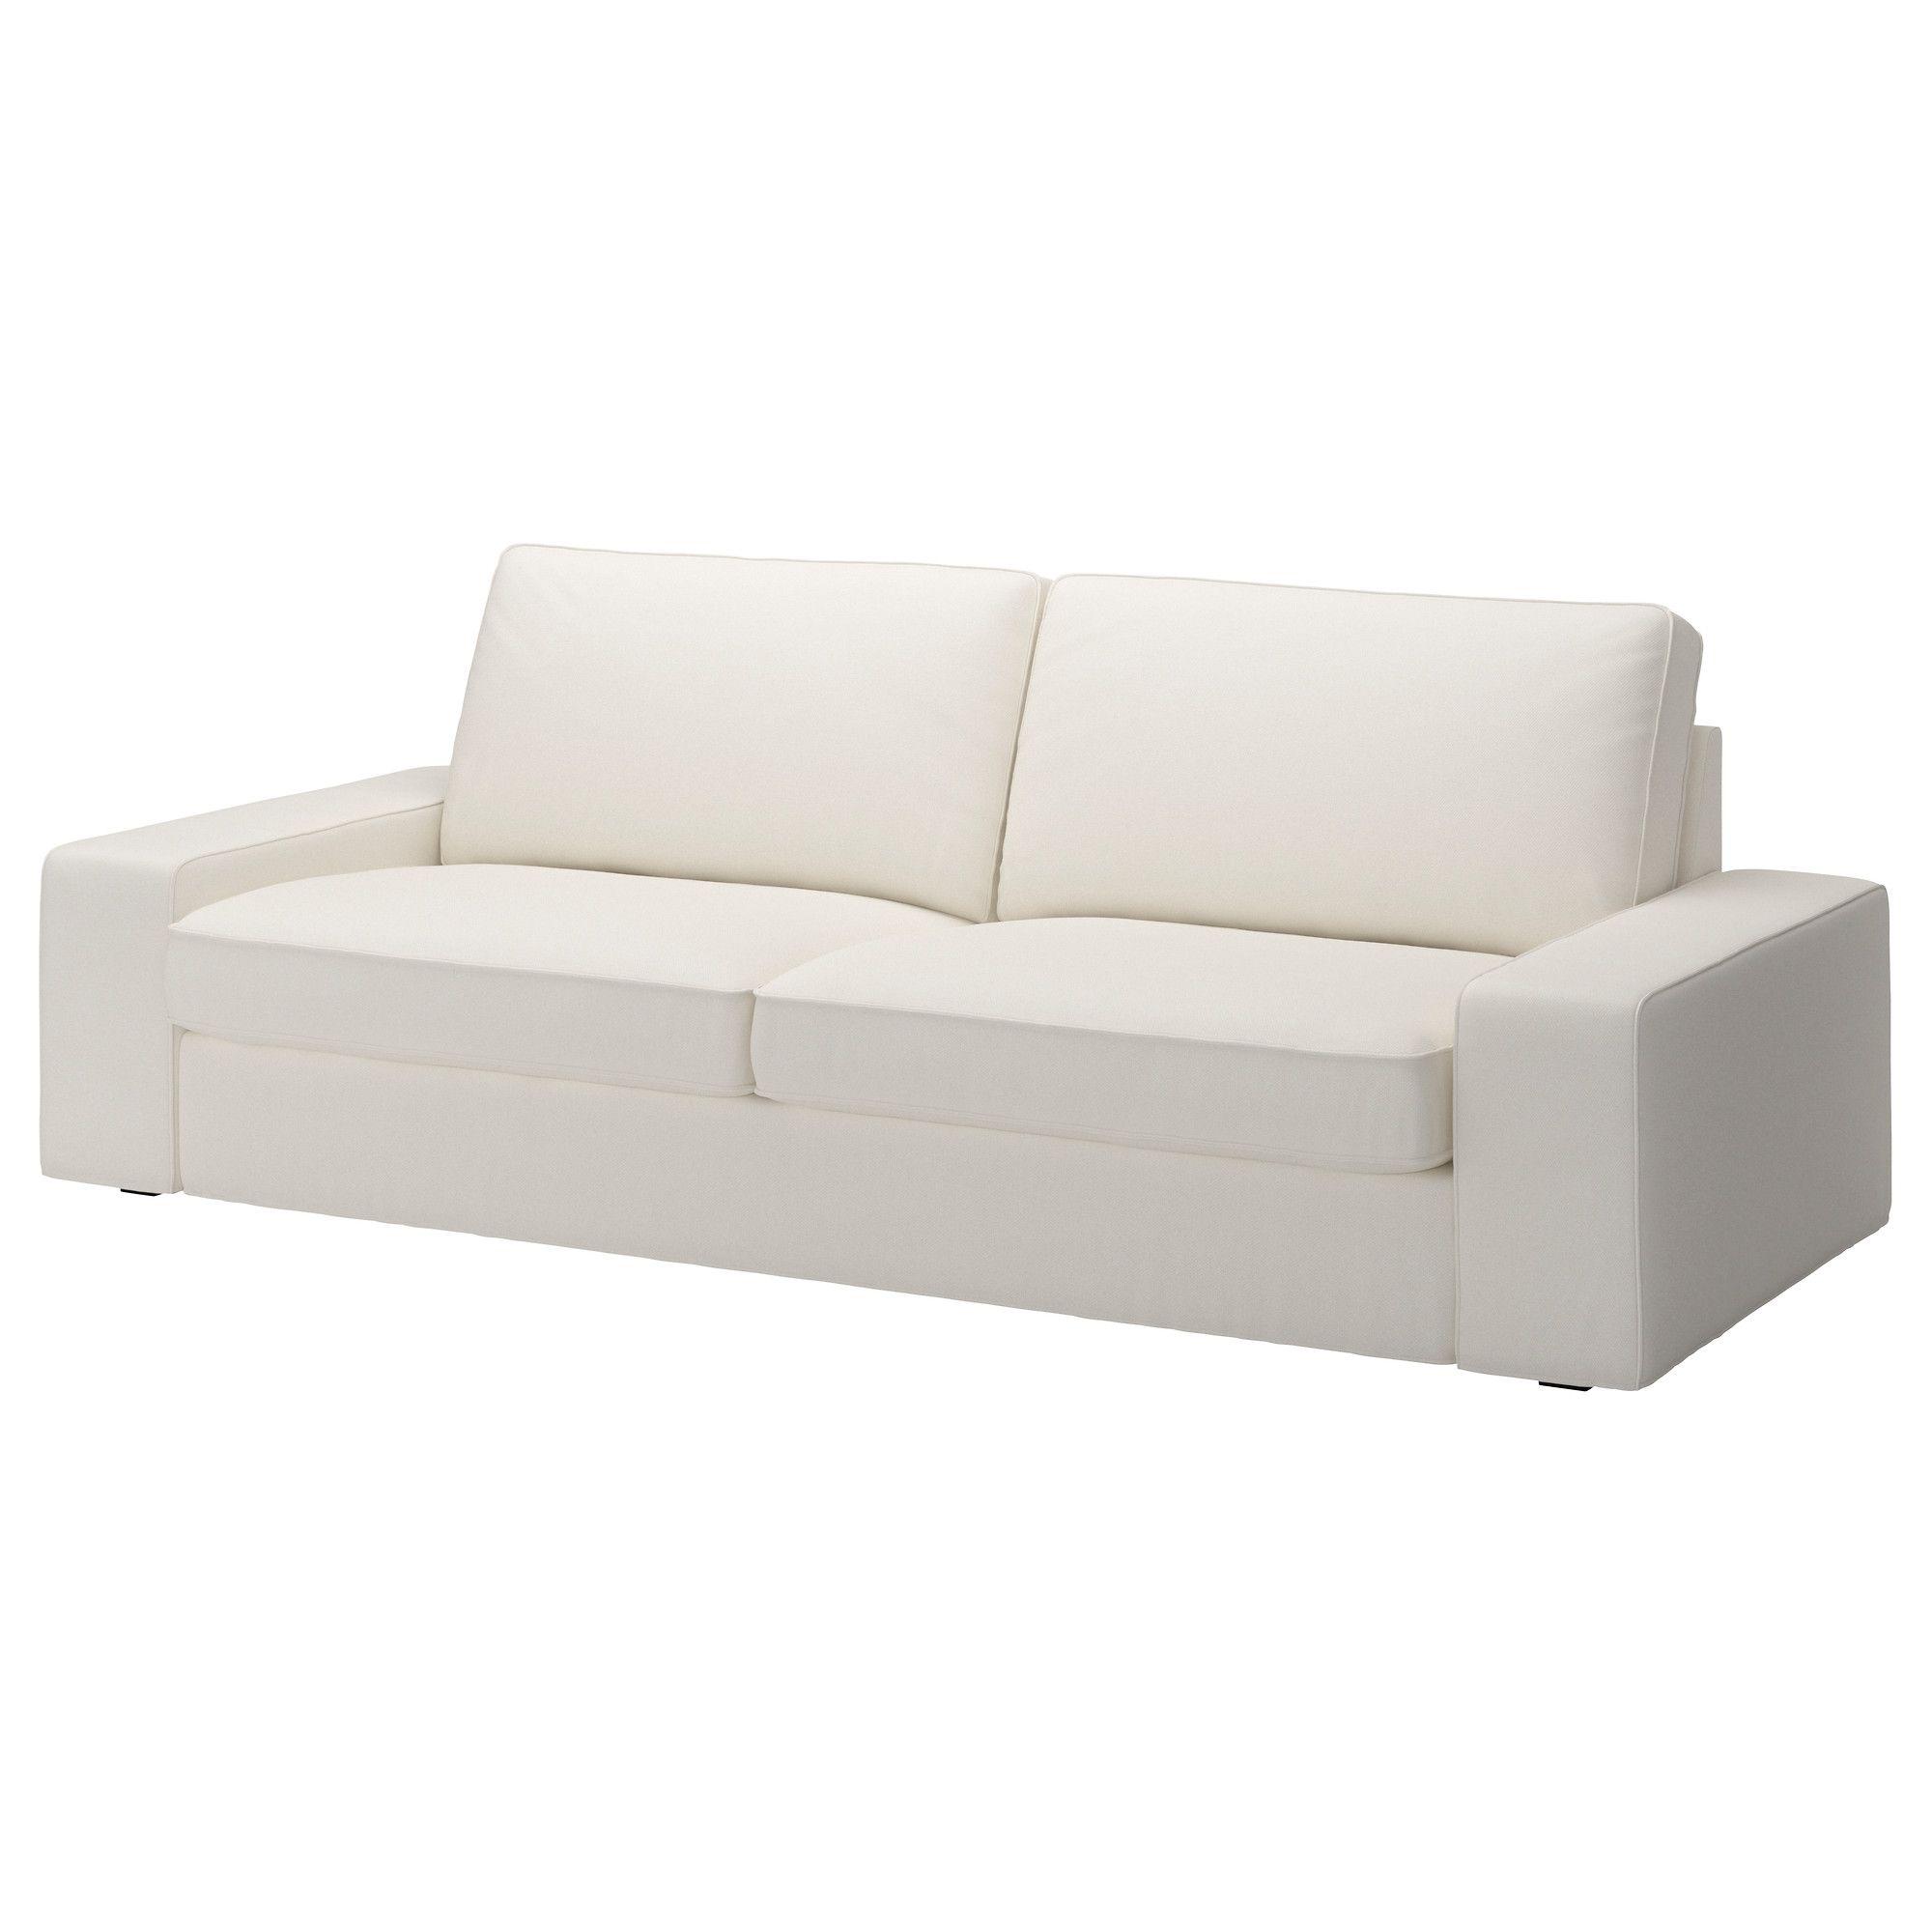 canap ikea kivik 3 places. Black Bedroom Furniture Sets. Home Design Ideas